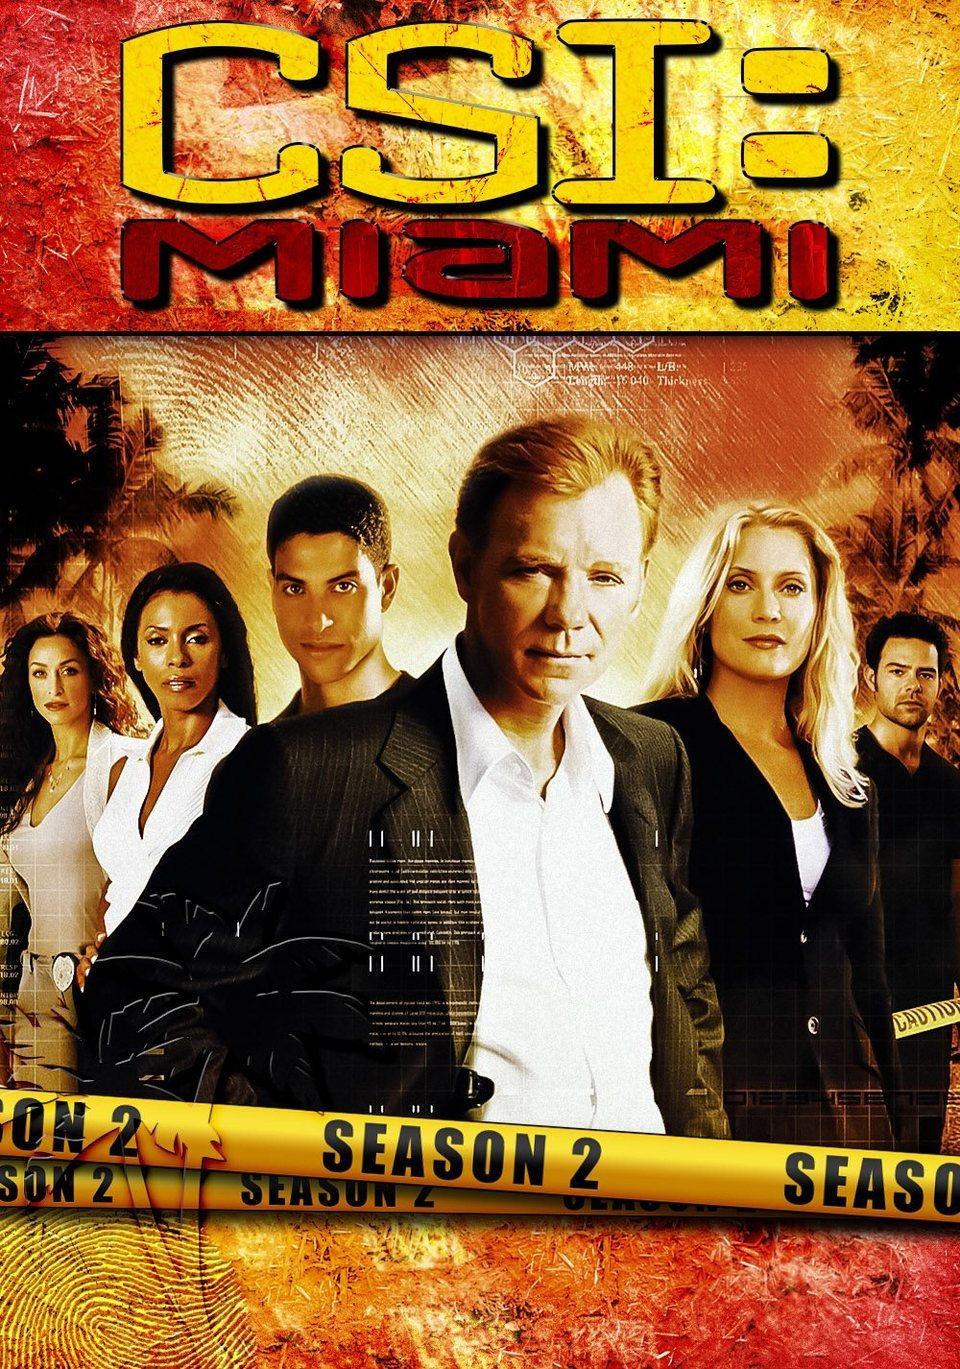 Cartel Temporada 2 de 'CSI: Miami'